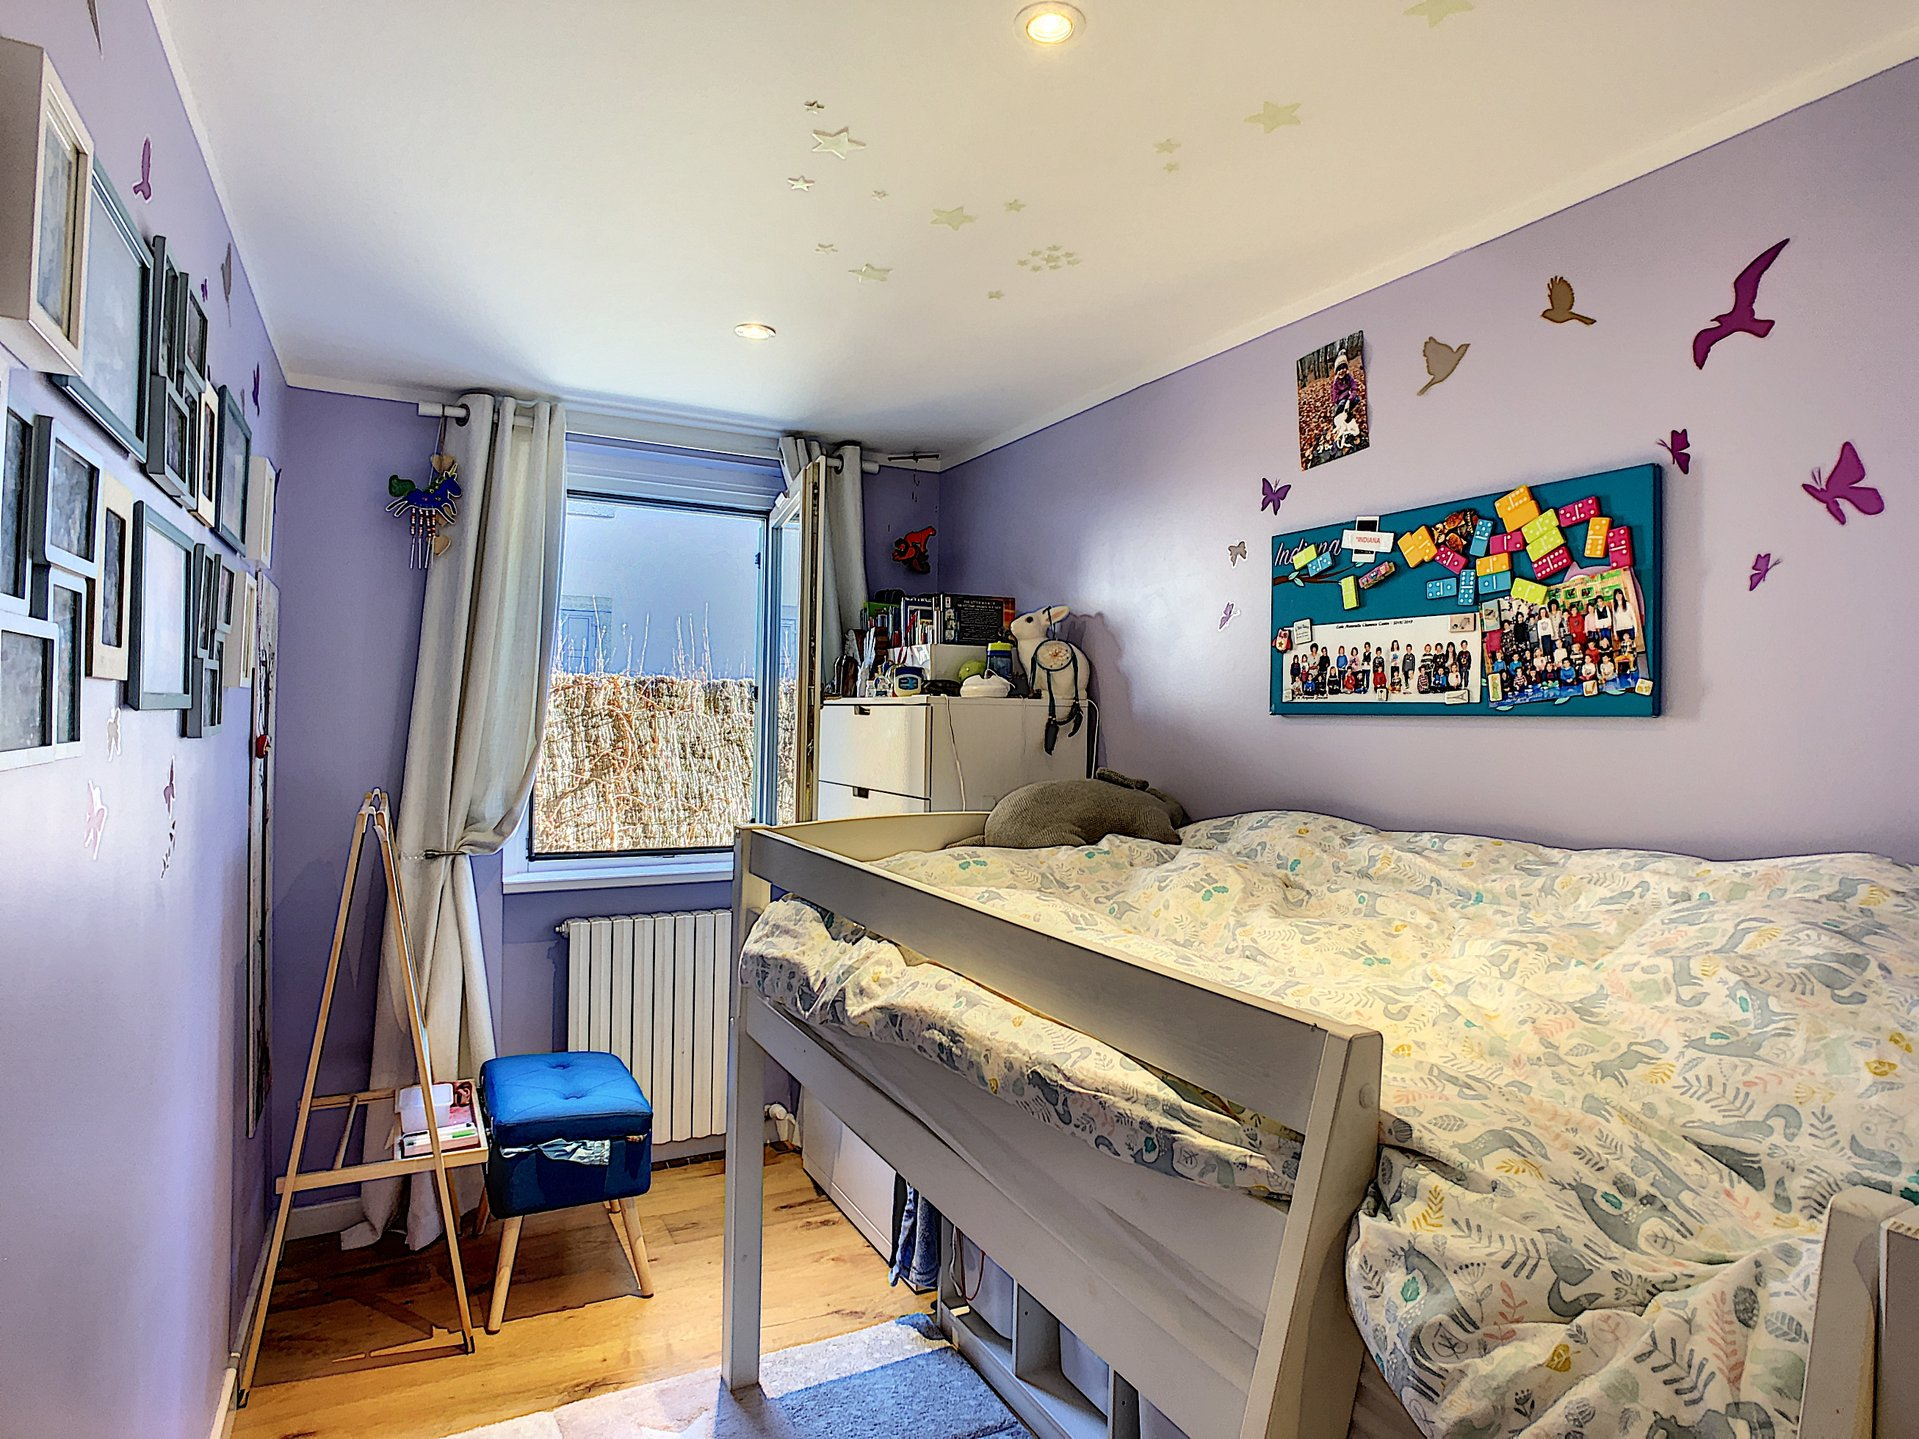 Apartement, 3 bedrooms, Chamonix Centre